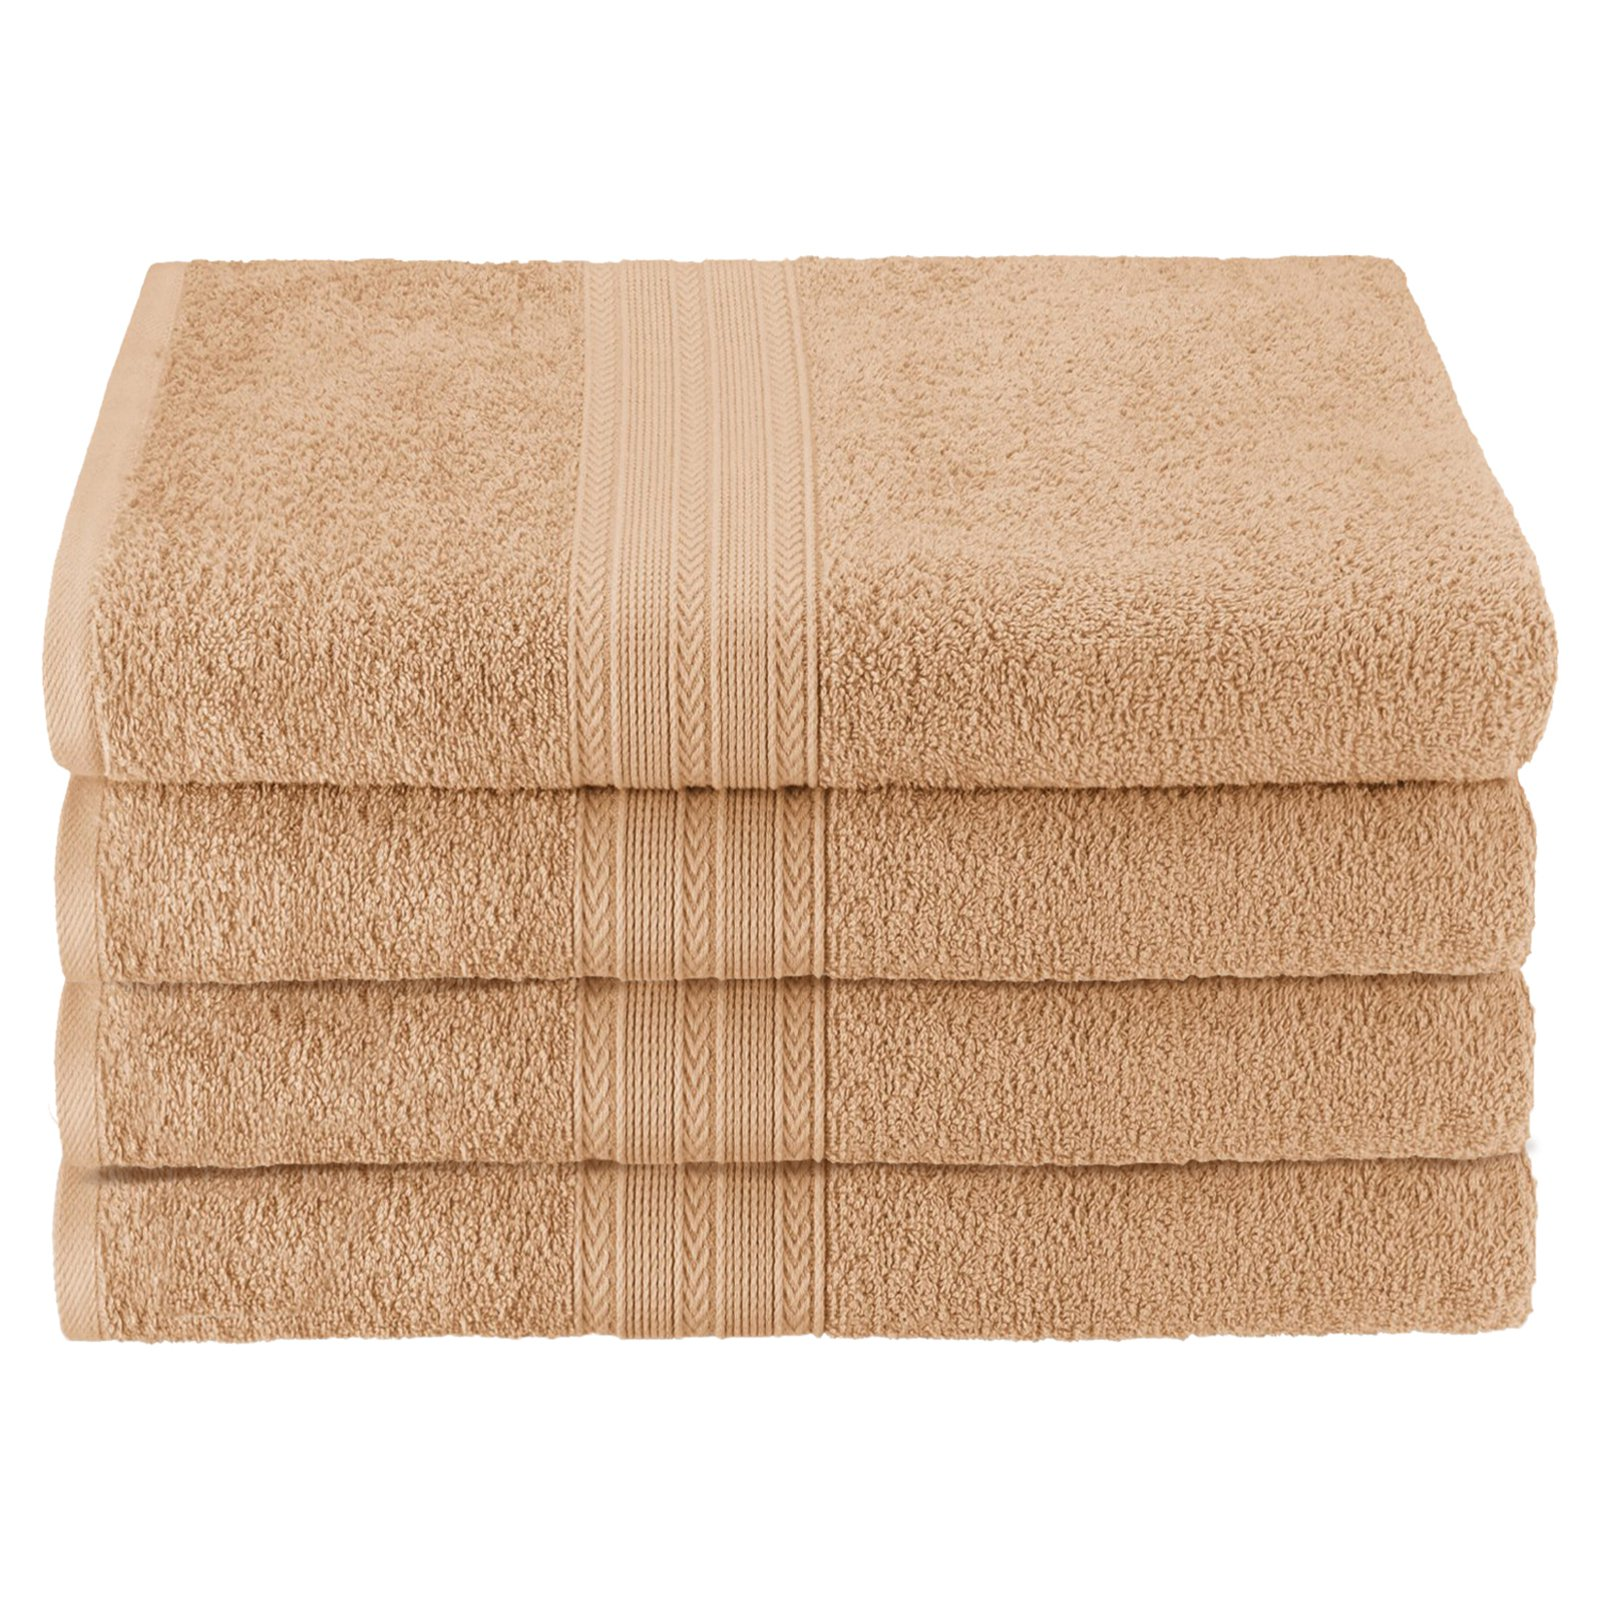 Superior Eco-Friendly 100% Ringspun Cotton 4Pc Bath Towel Set